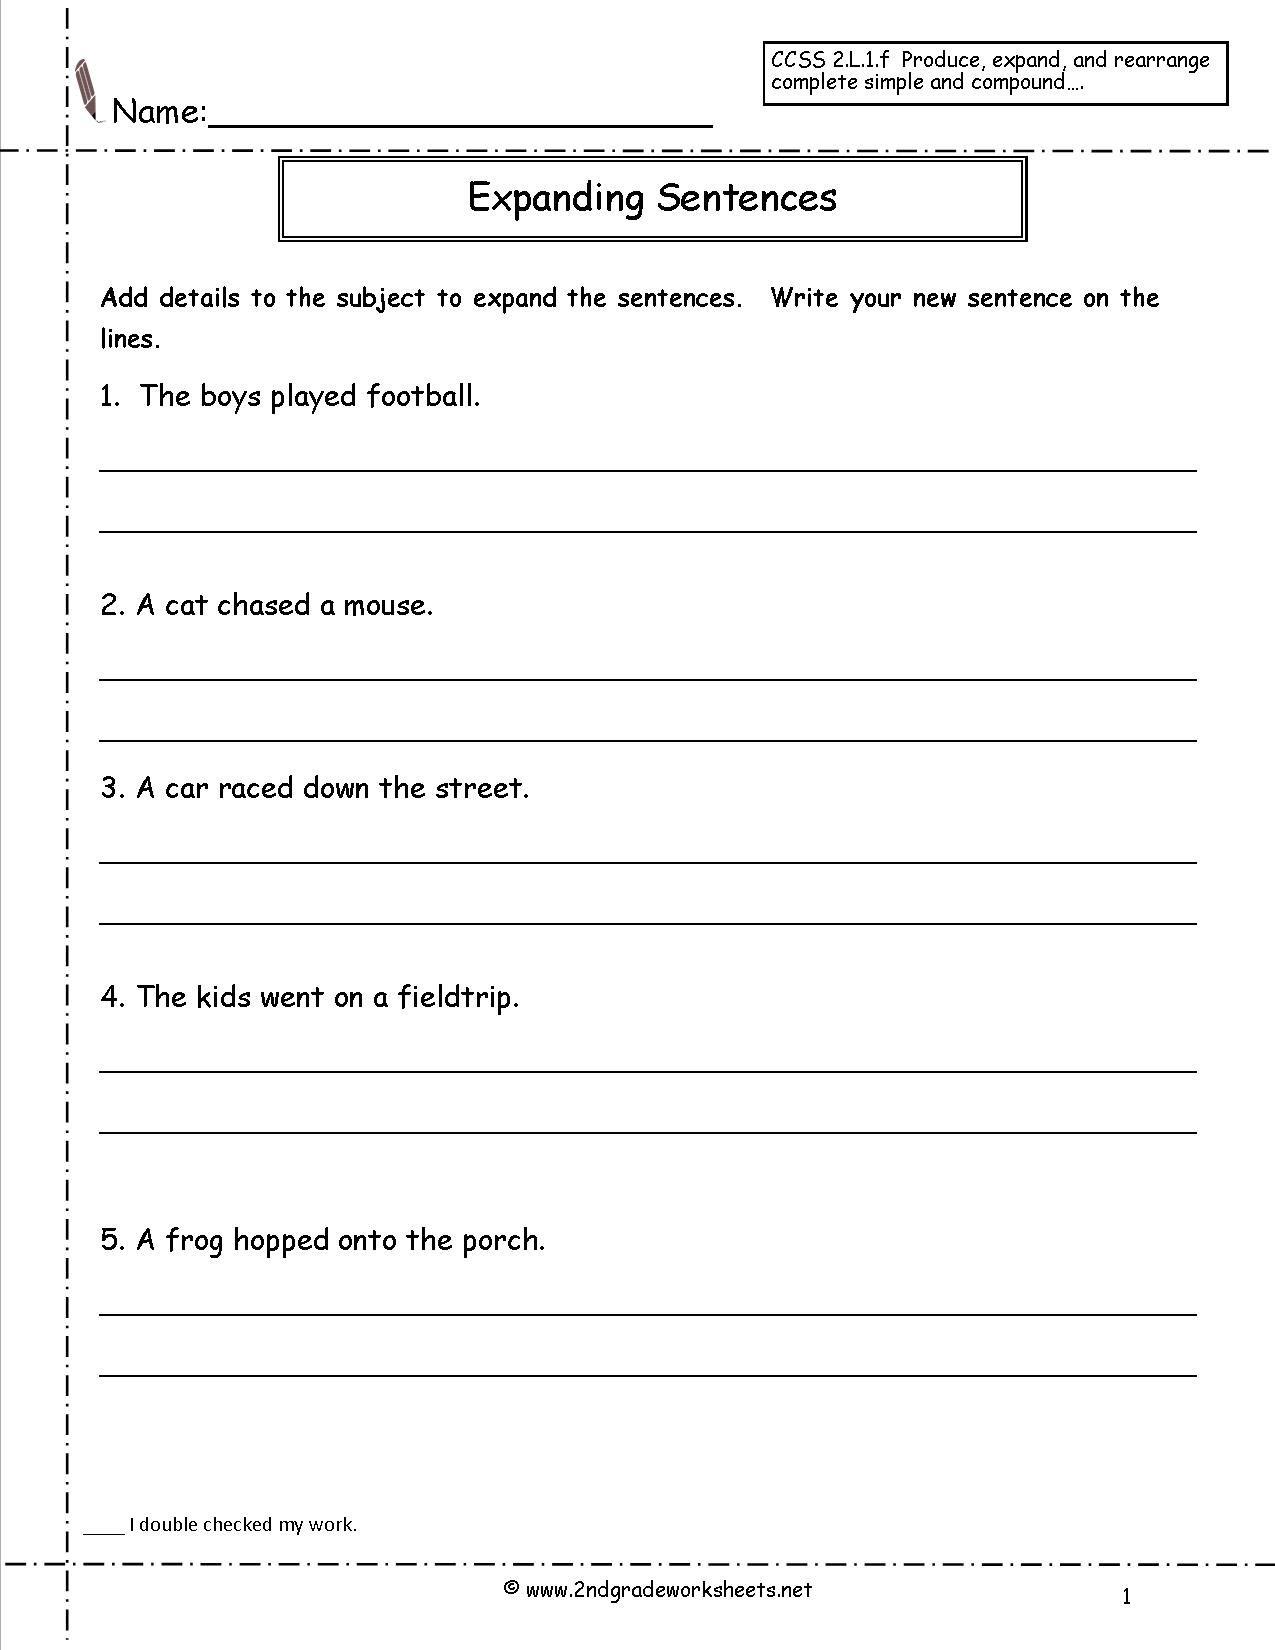 Related Image Writing Sentences Worksheets Writing Practice Worksheets Sentence Writing